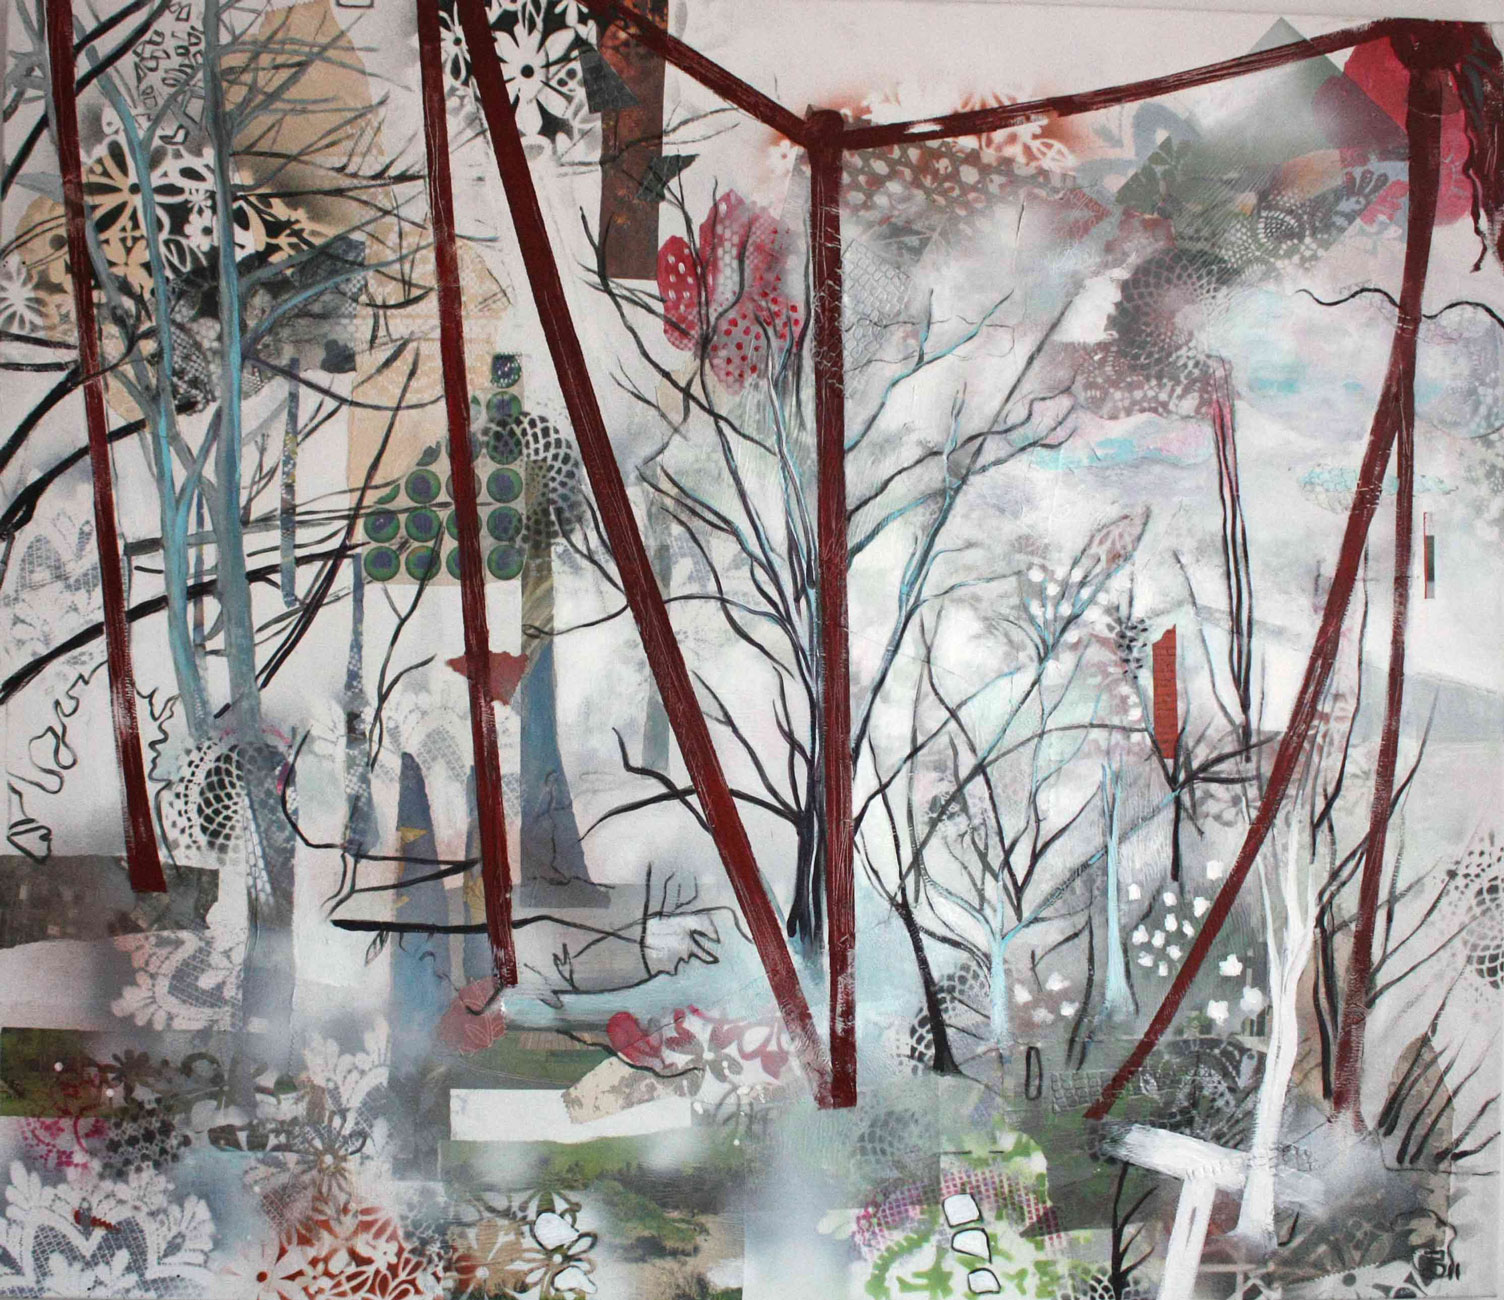 Danielle Beckers Kunstcentrum Weert